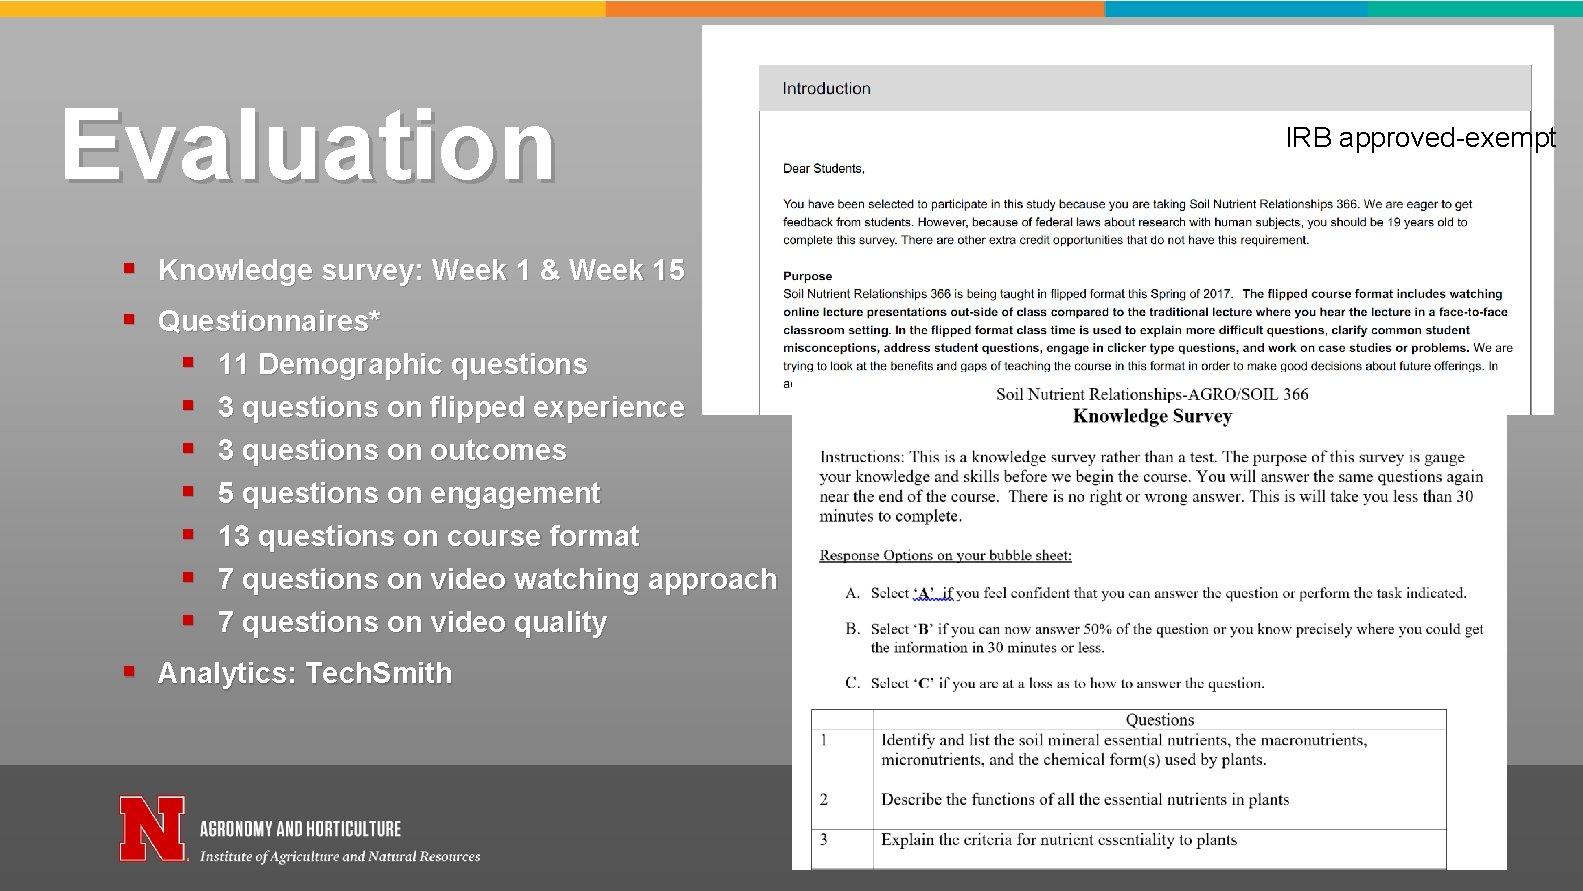 Evaluation § Knowledge survey: Week 1 & Week 15 § Questionnaires* § 11 Demographic